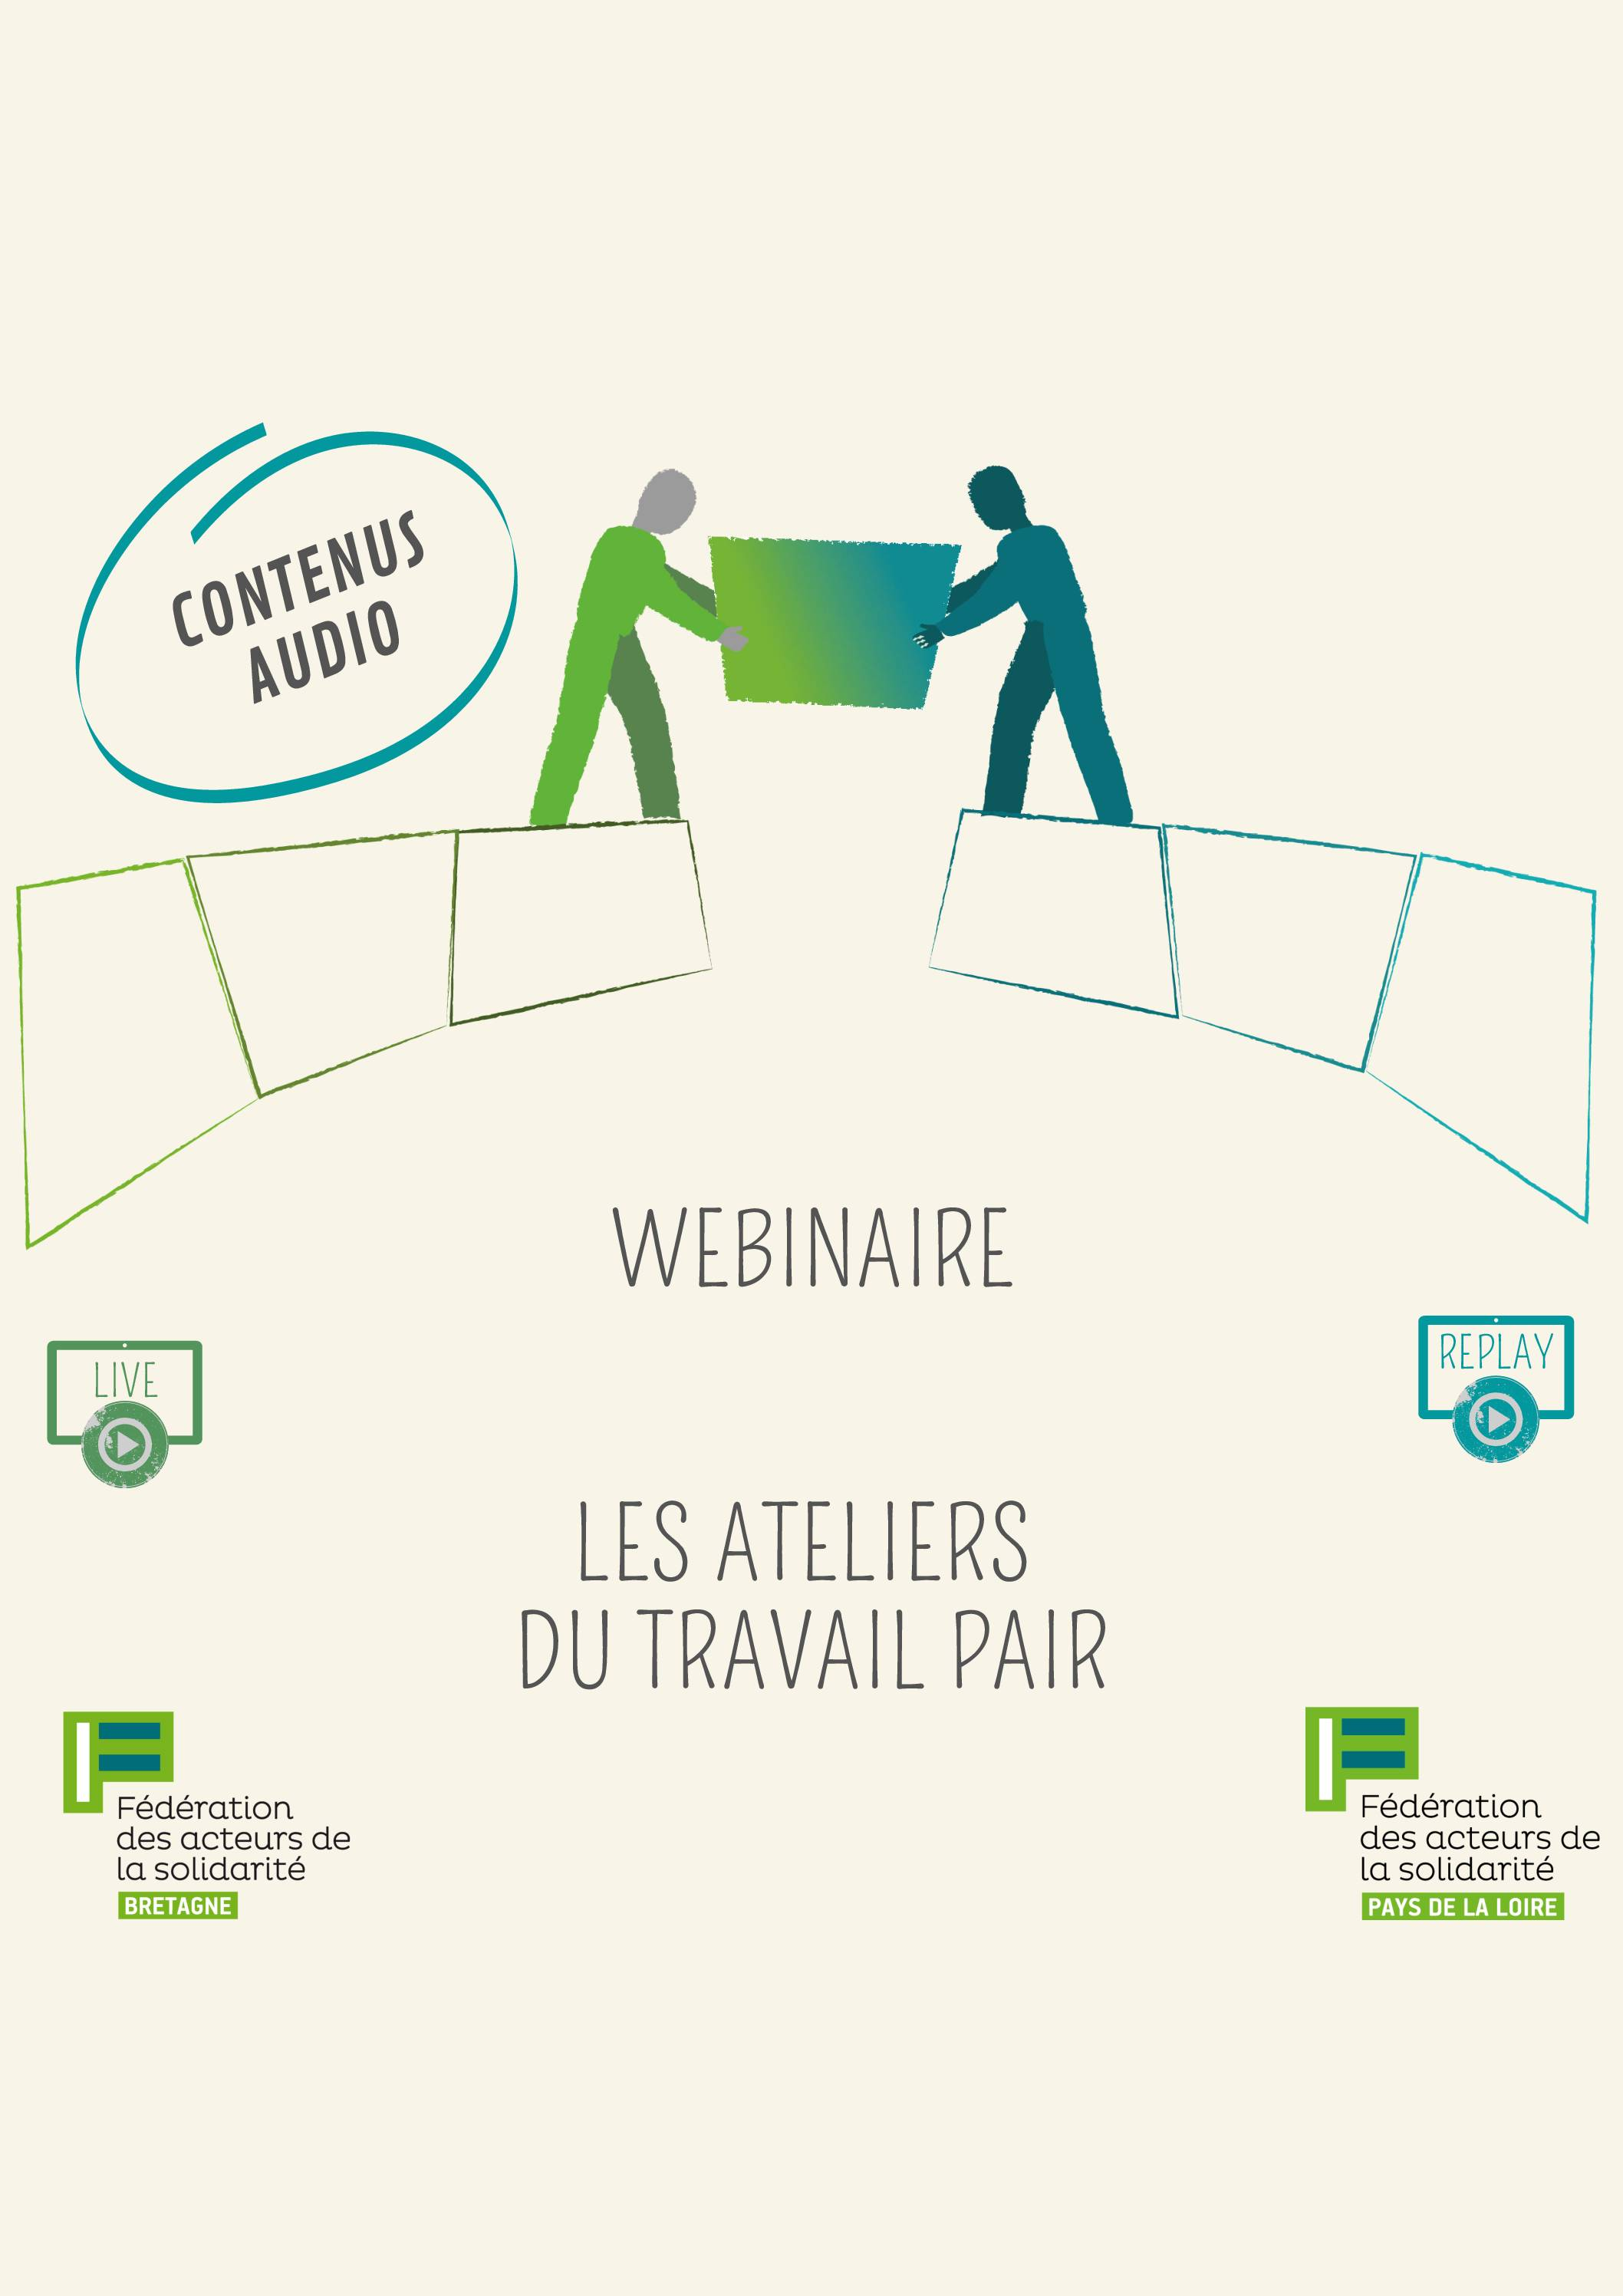 TRAVAIL PAIR - Les contenus audios de la FAS Bretagne